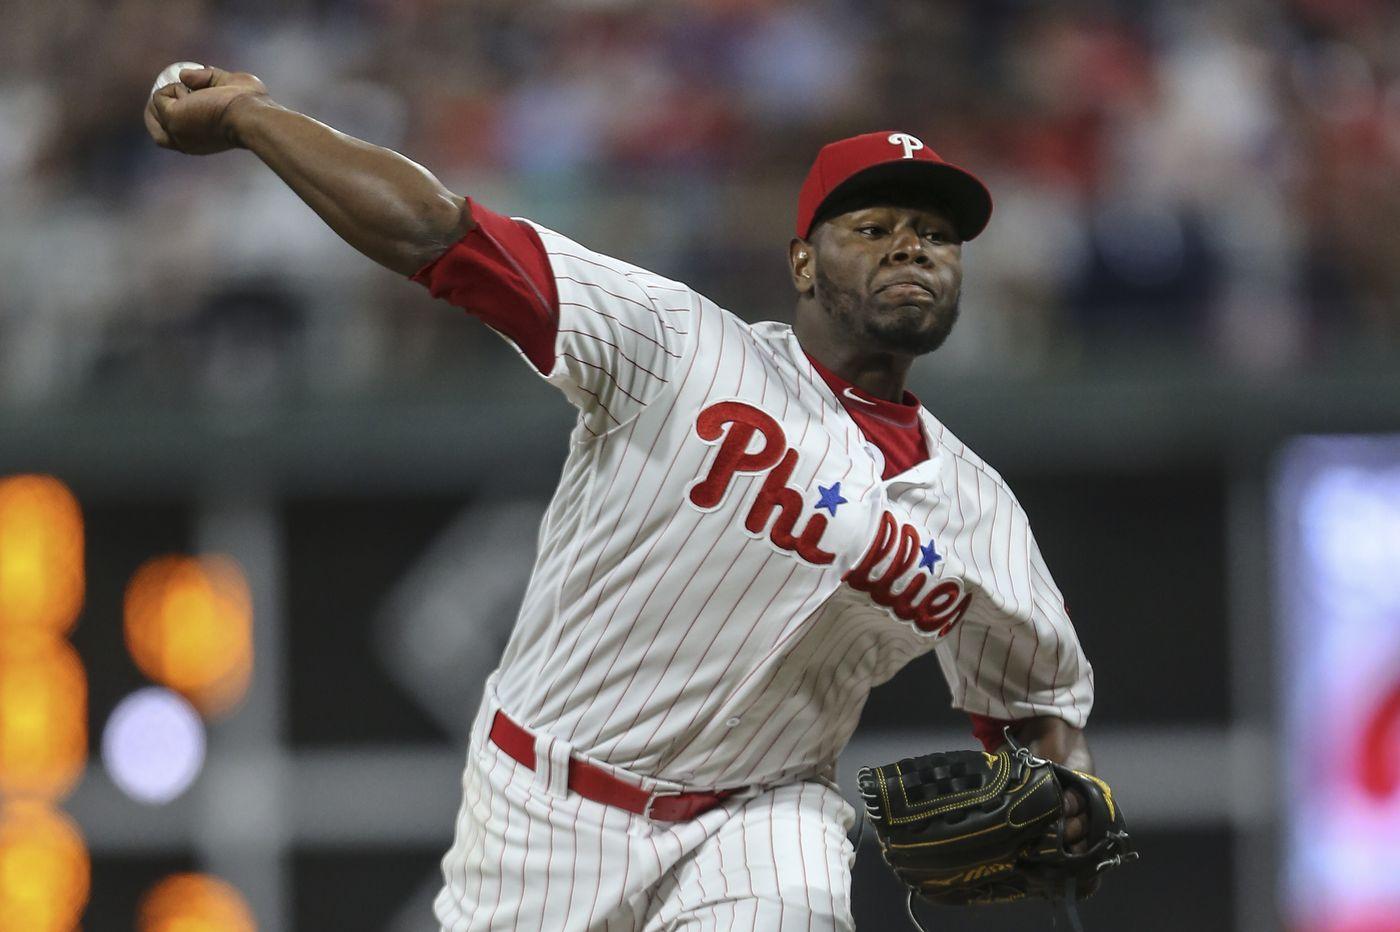 Hector Neris returns to Phillies' bullpen with confident splitter